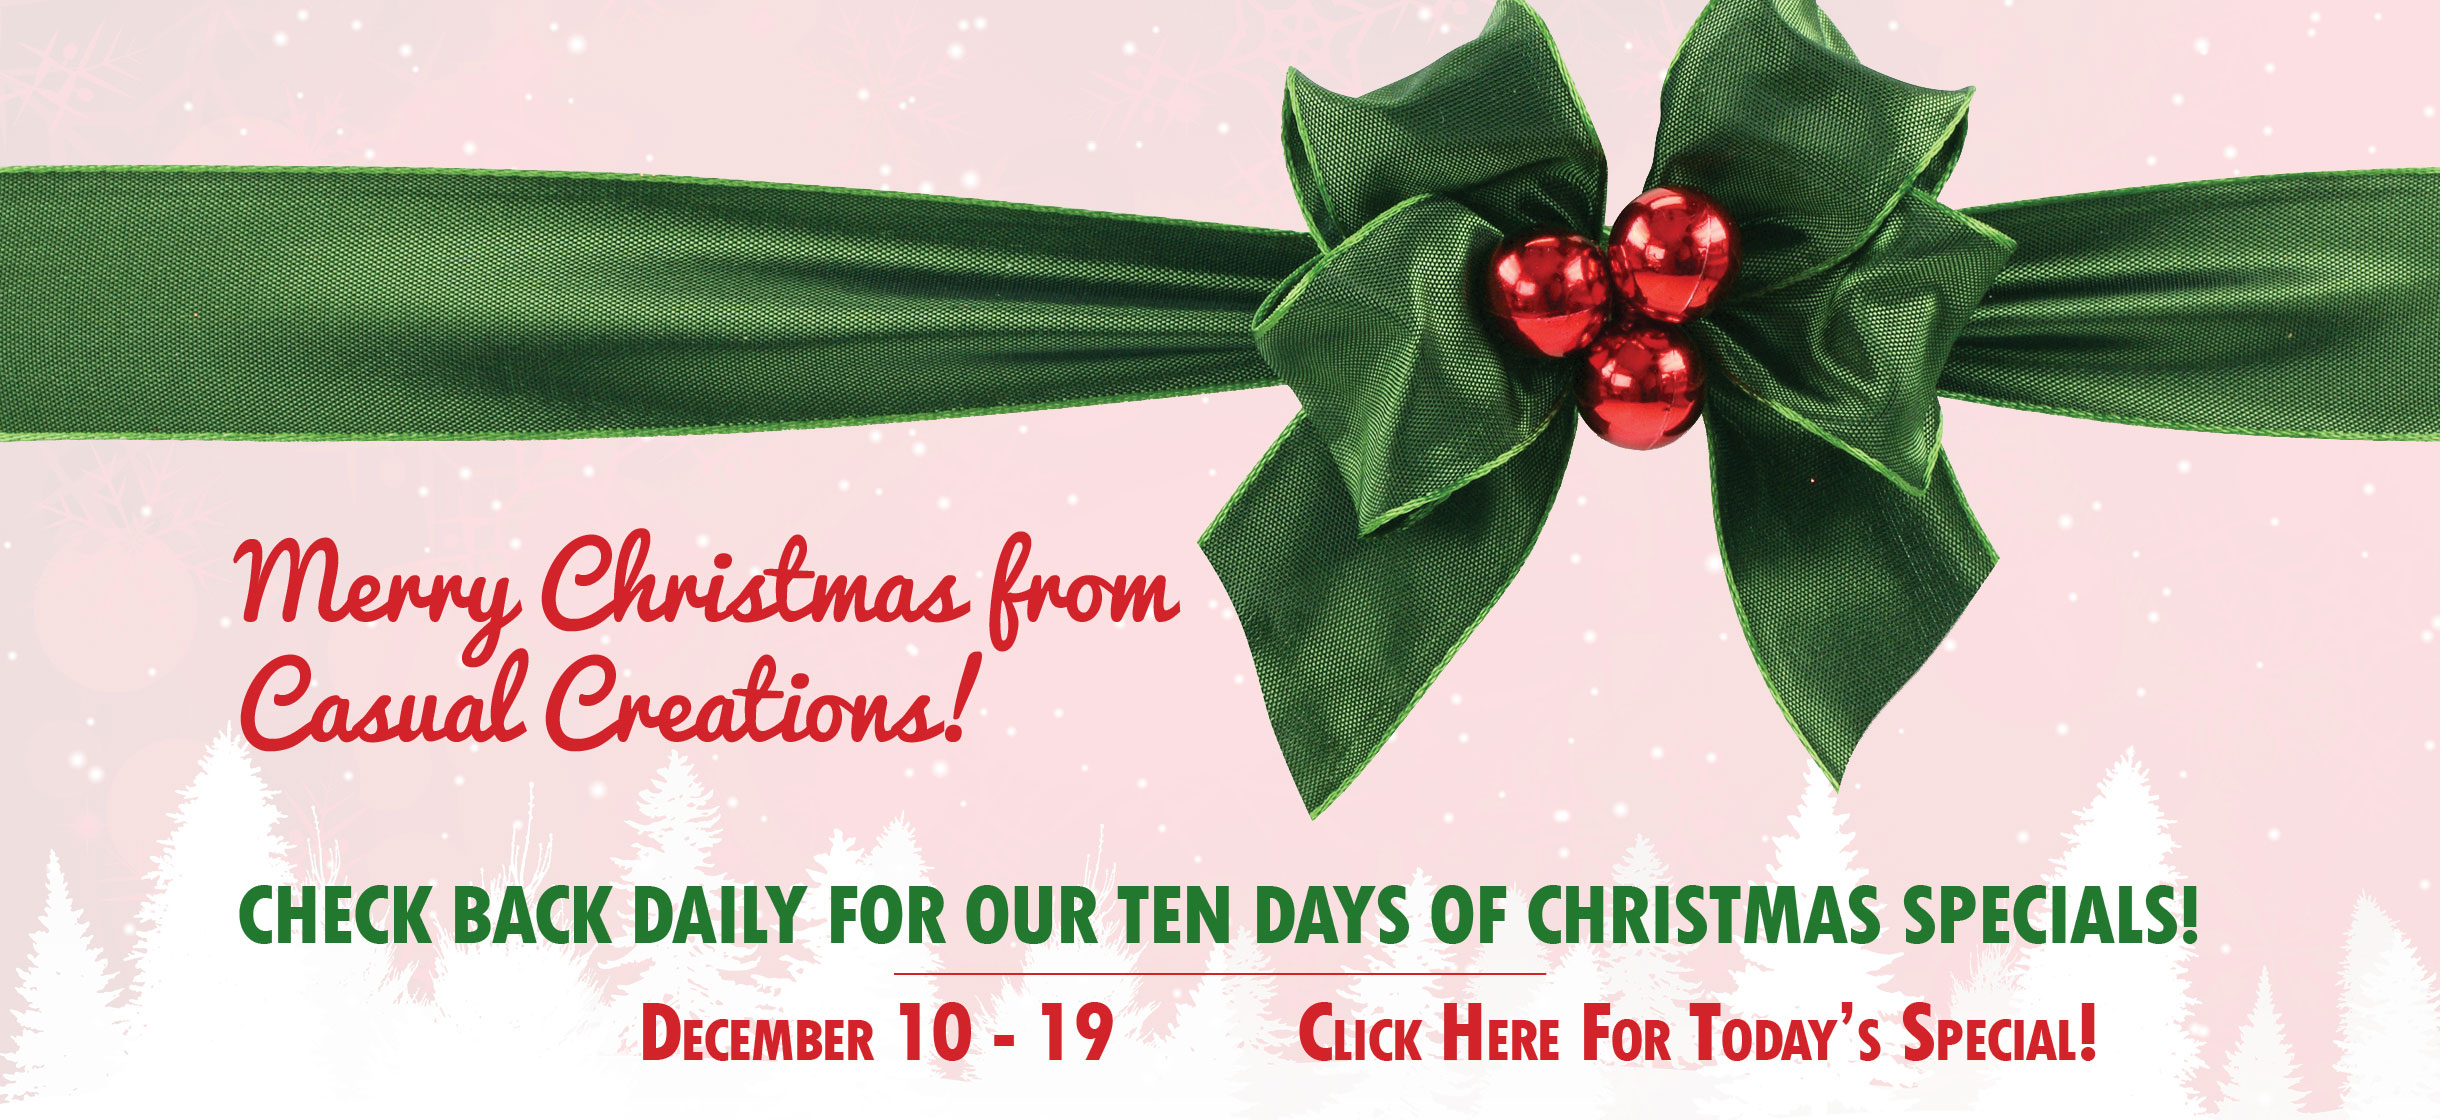 Christmas-Specials.jpg